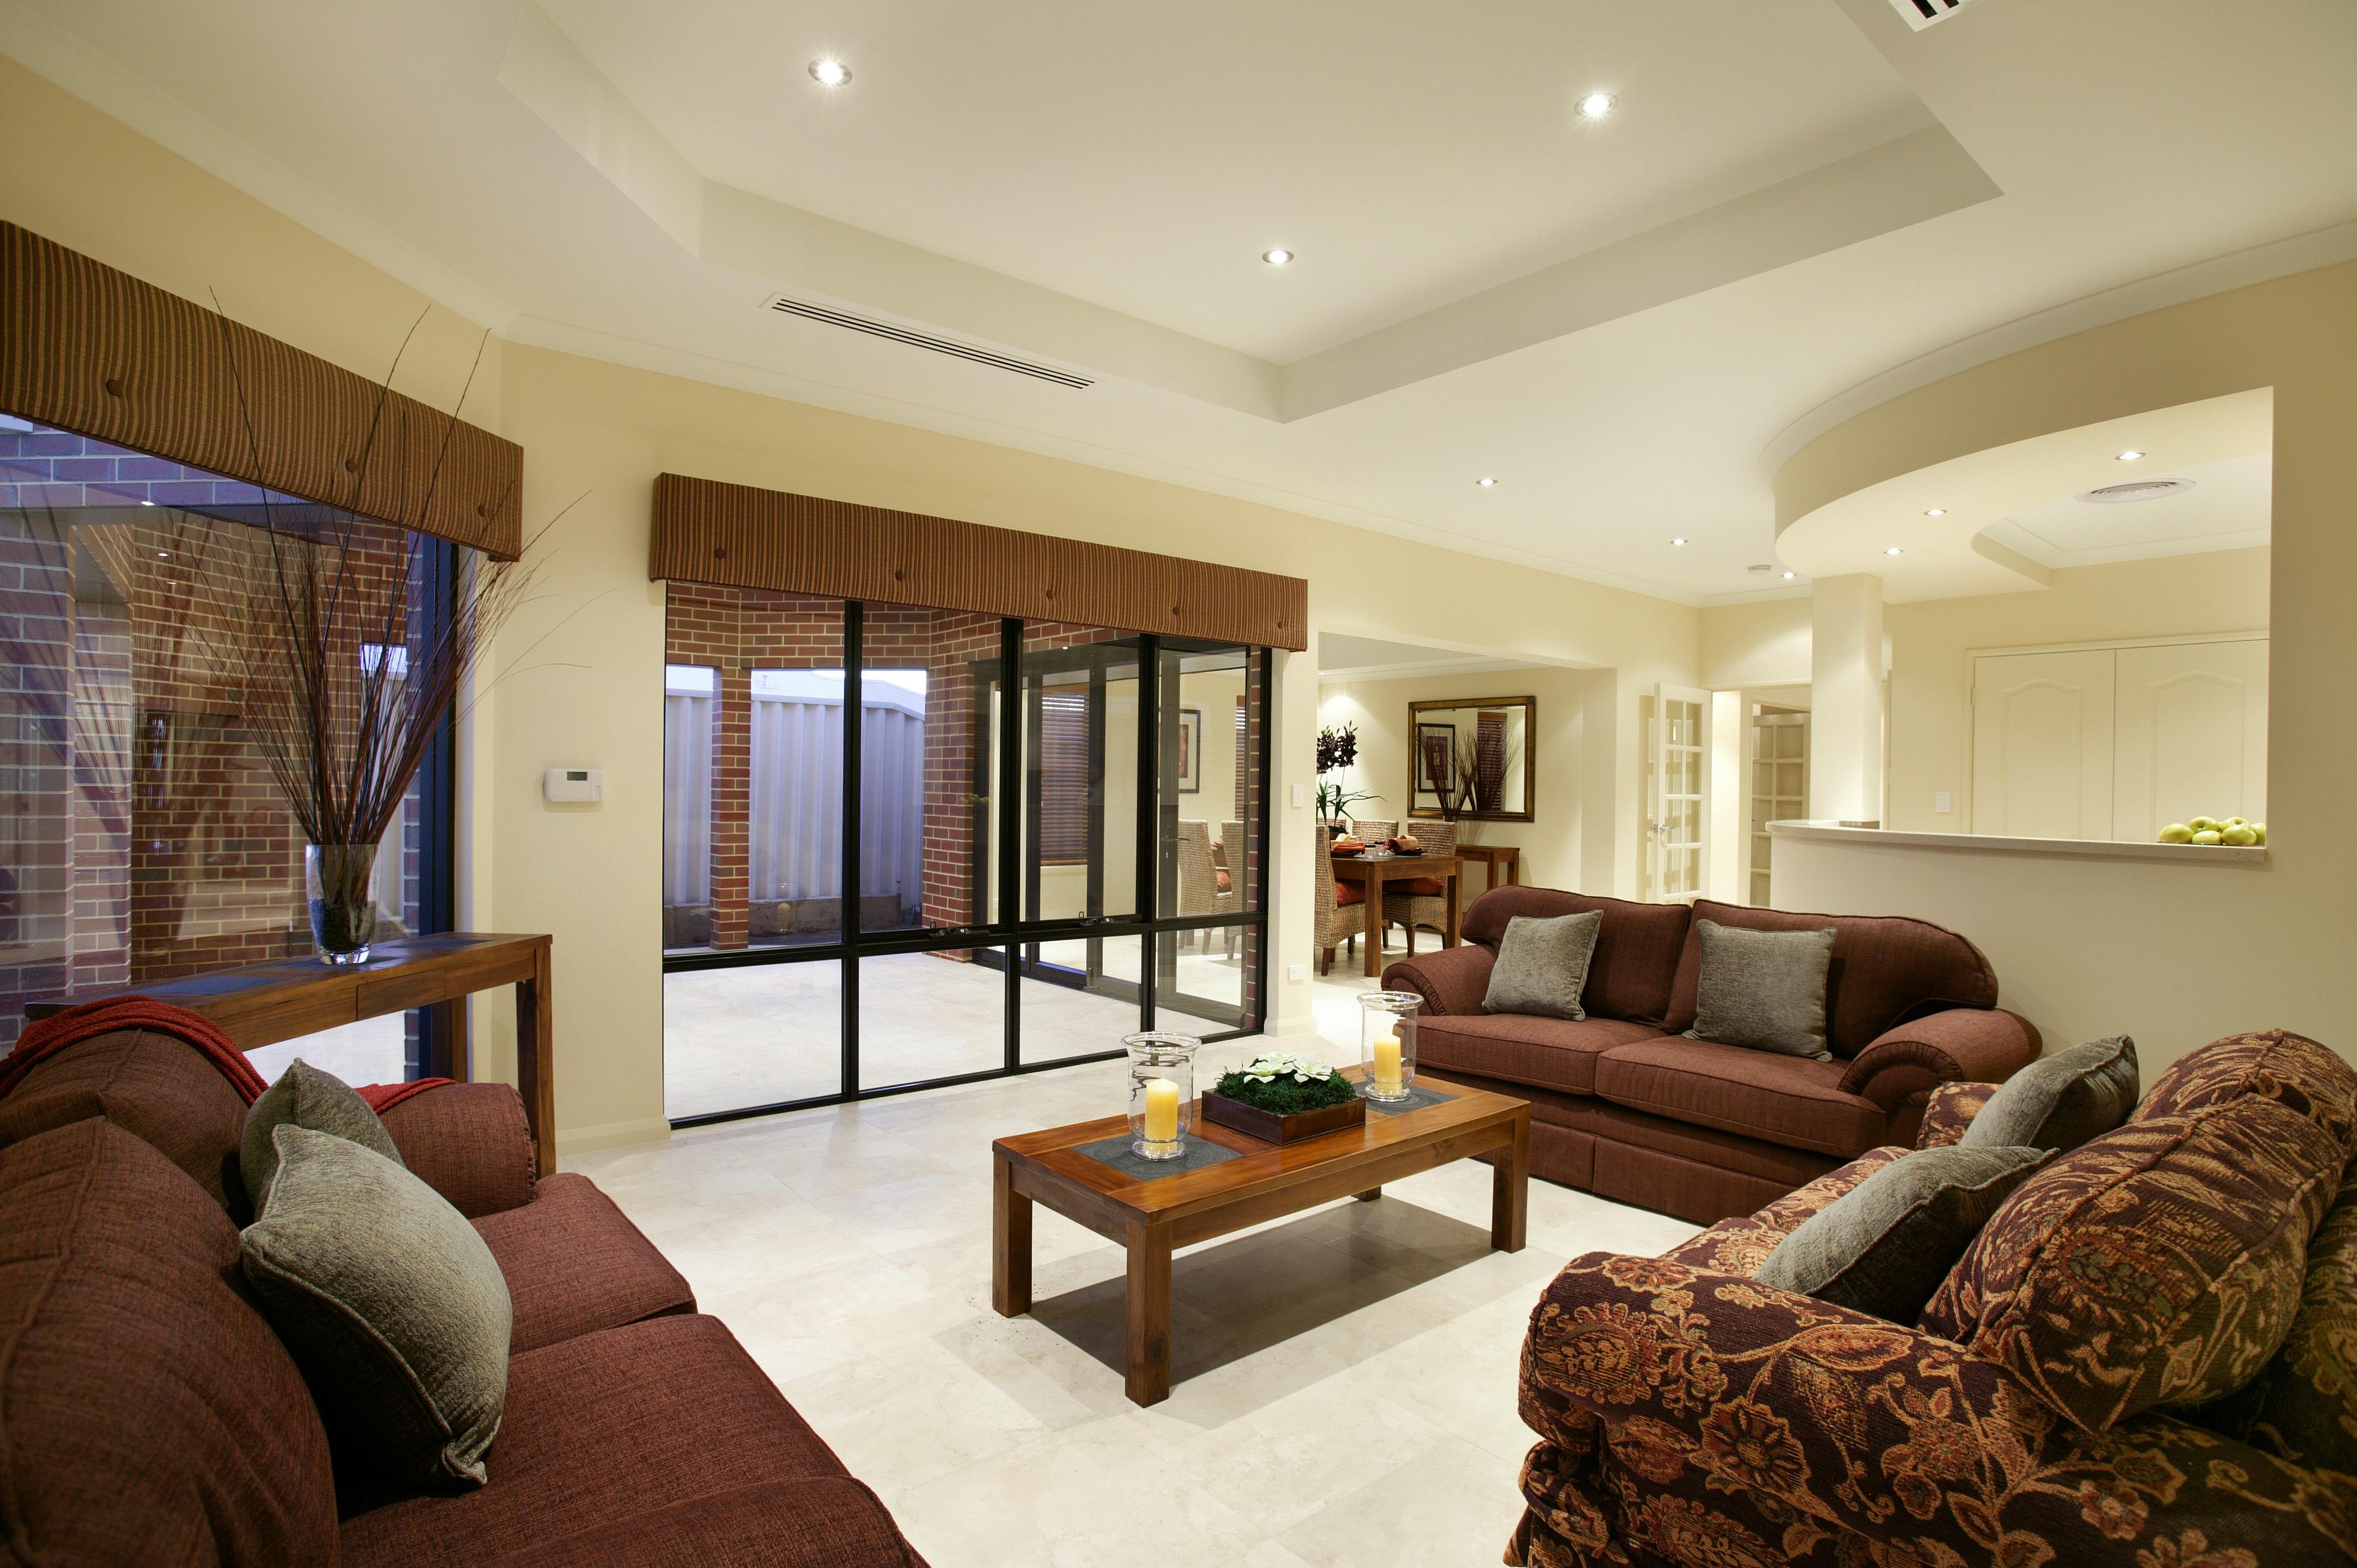 Popular Best Interior House Designs With E Interior Design Ideas For Homes High Definion Image